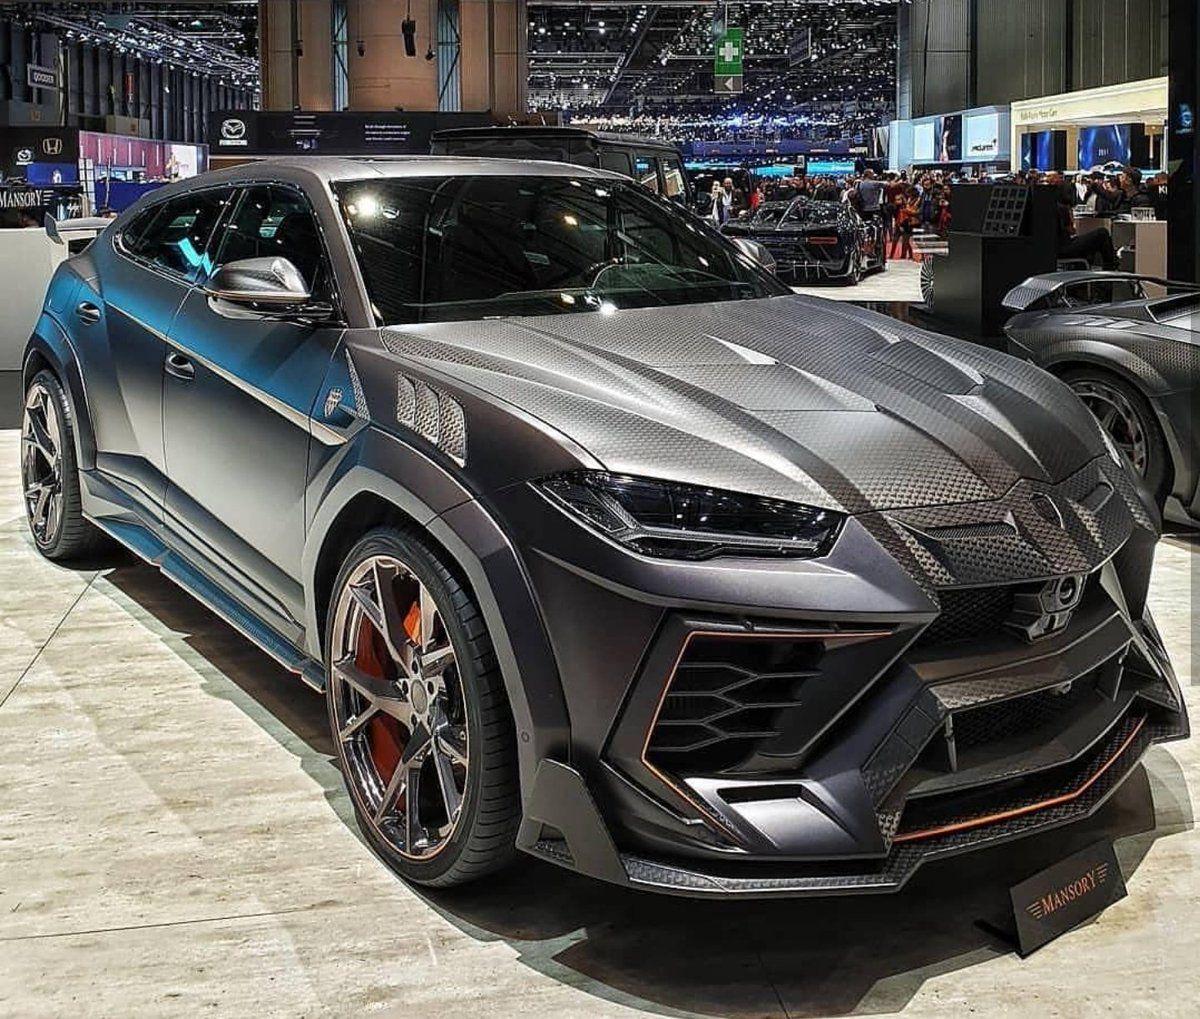 Dailylamborghini Dailylambotm On Twitter In 2020 Lamborghini Cars Suv Cars Luxury Cars